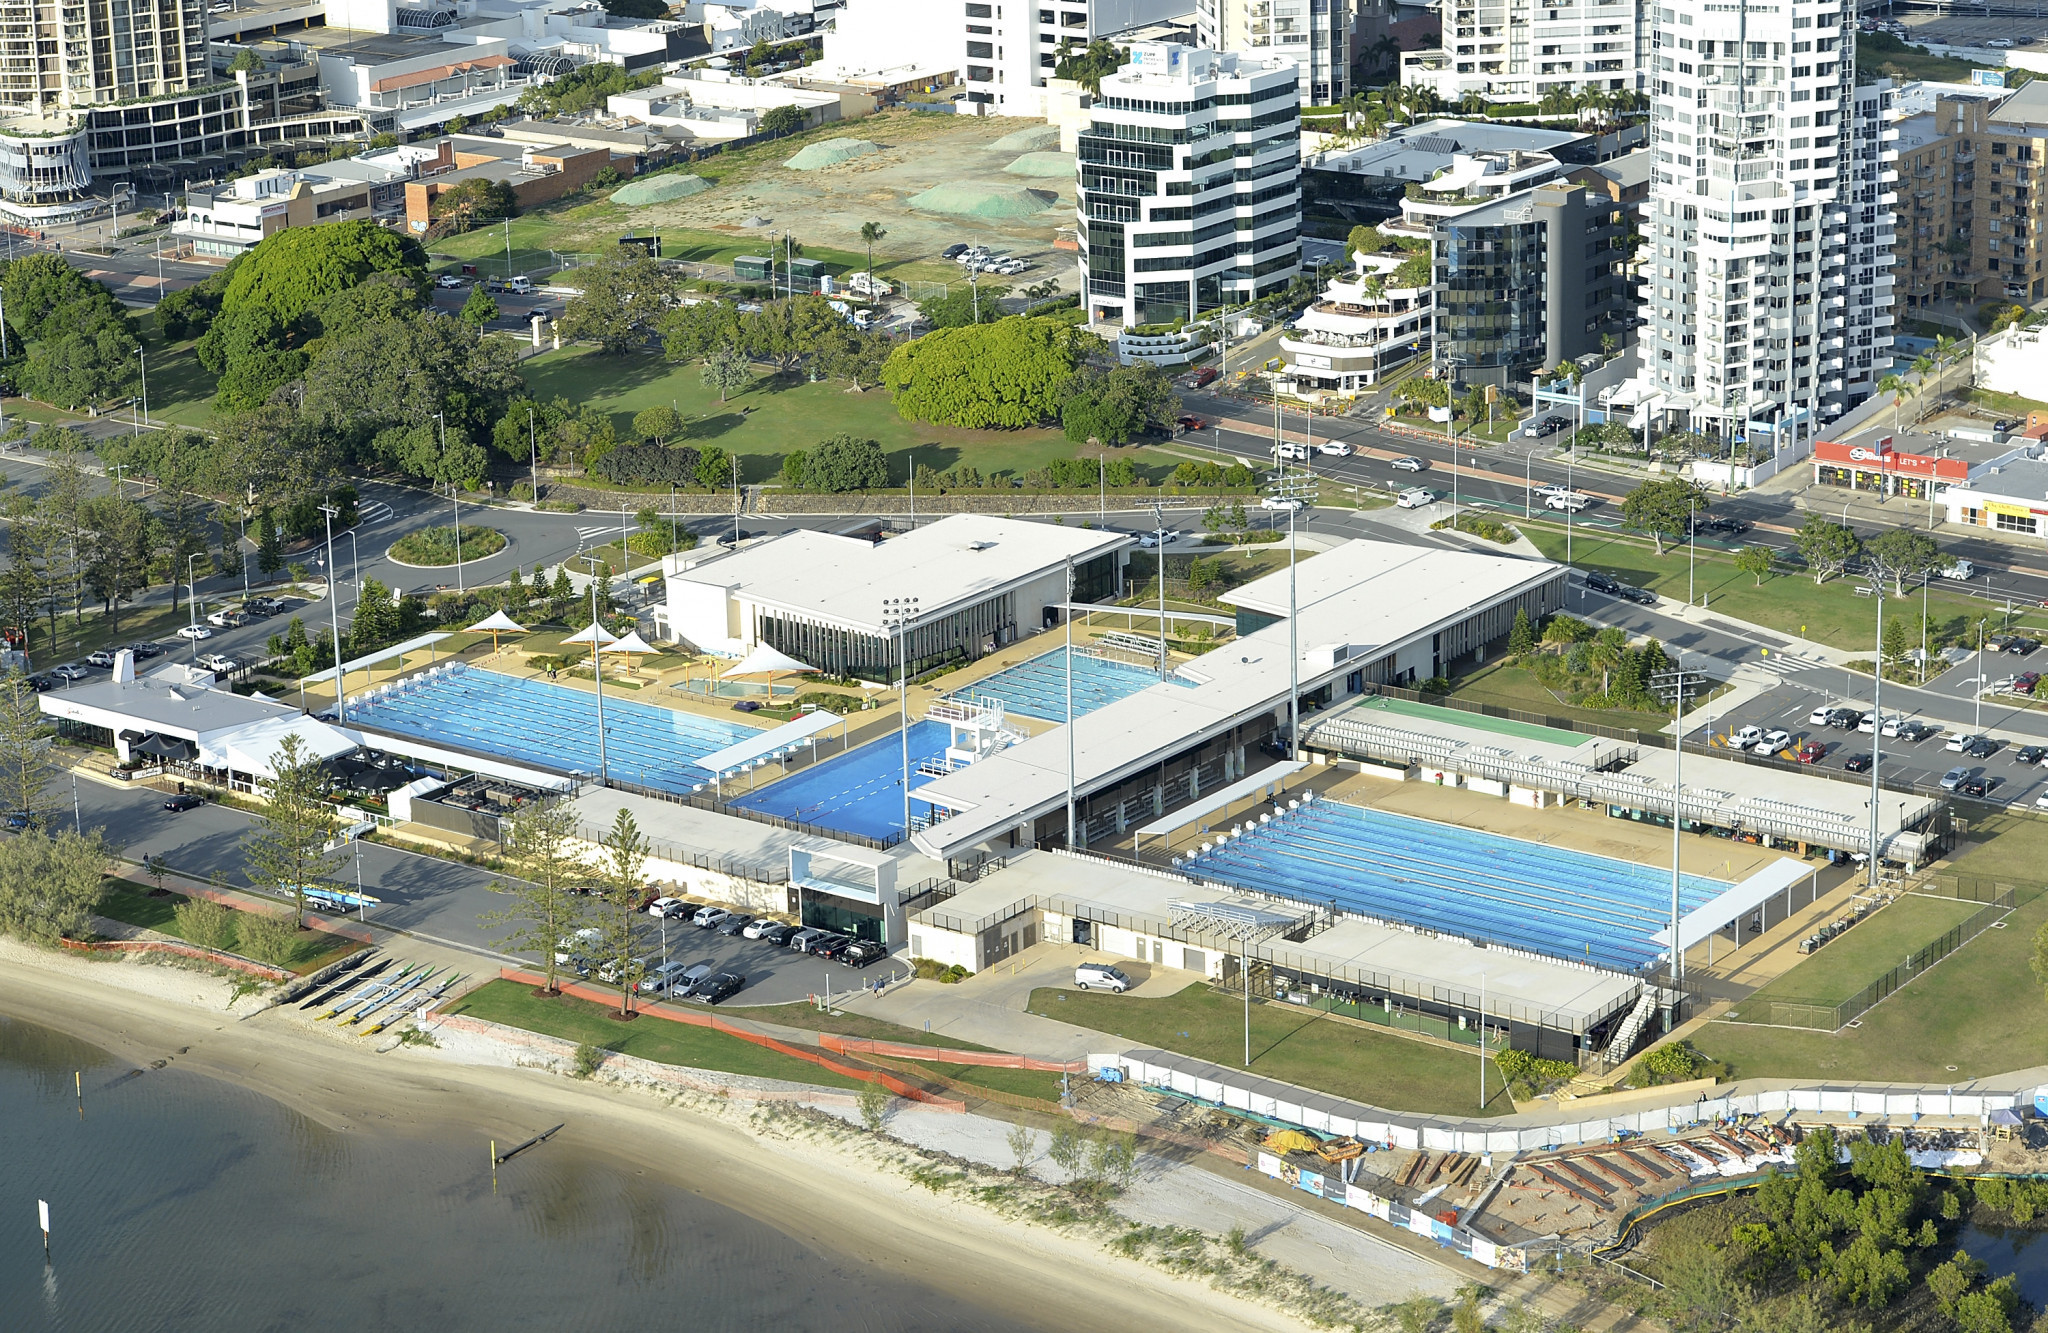 FINA Diving Grand Prix series set to conclude at Gold Coast 2018 venue